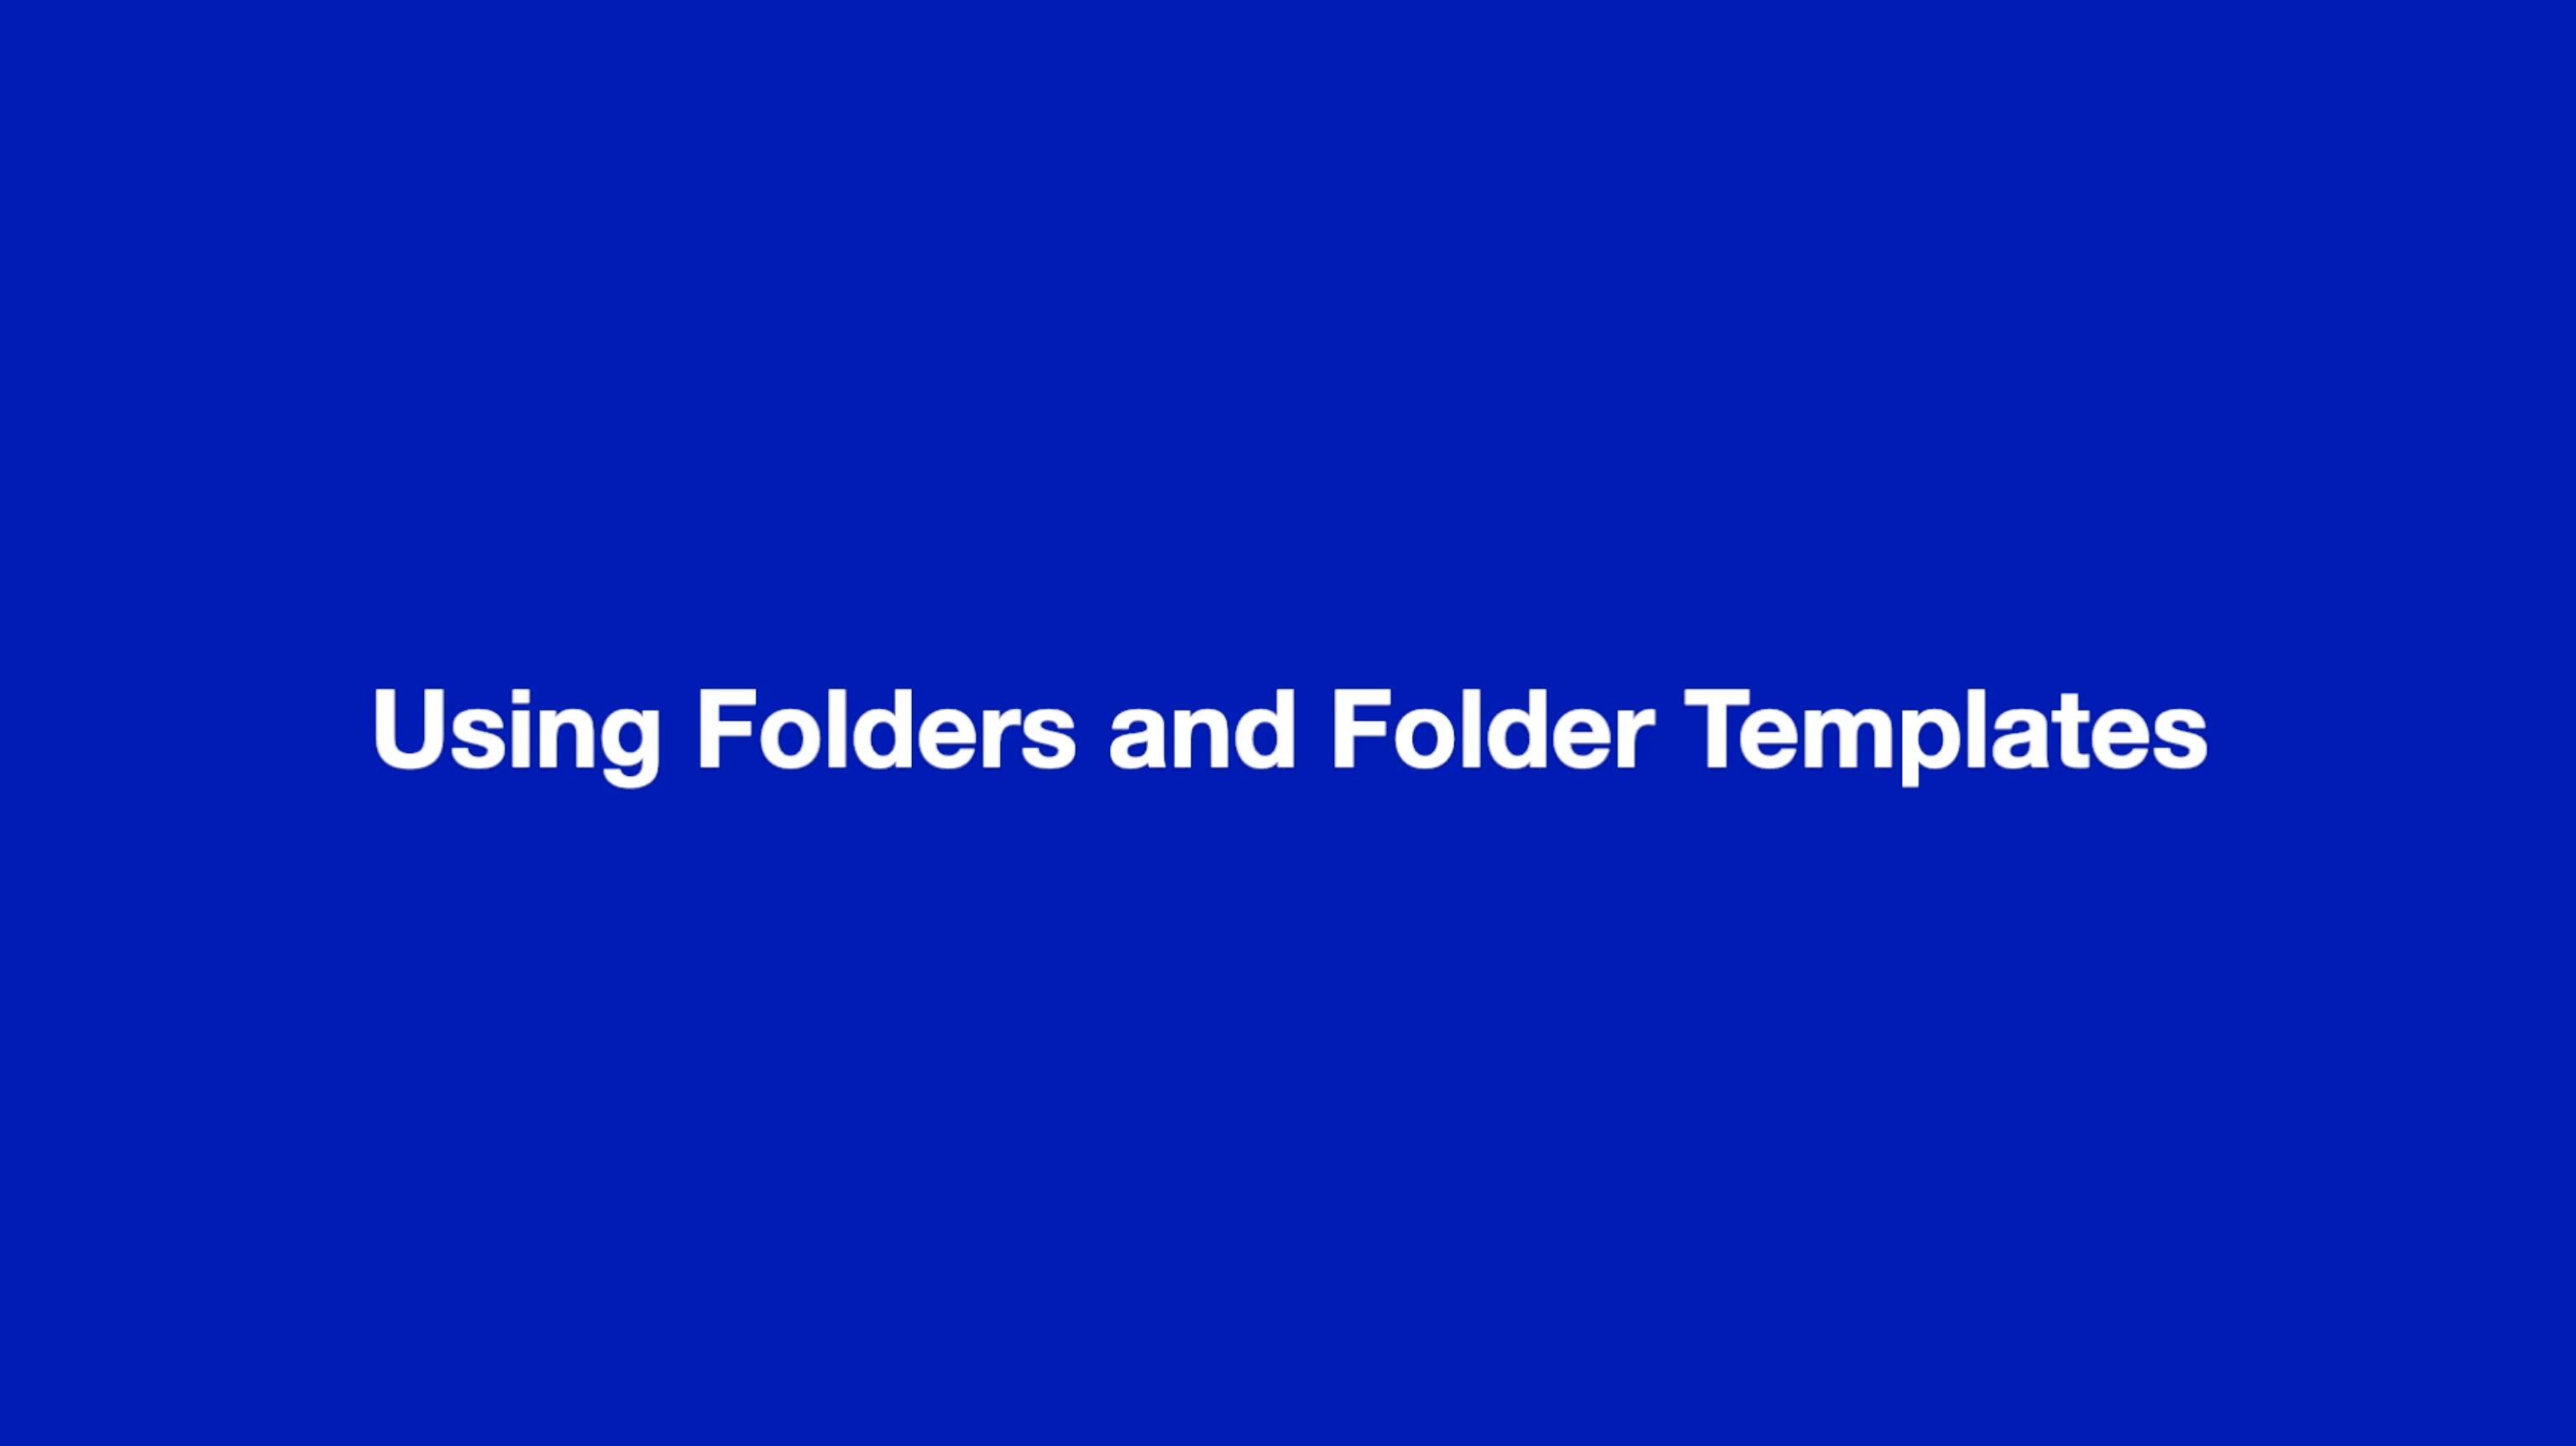 Using folders and folder templates thumbnail